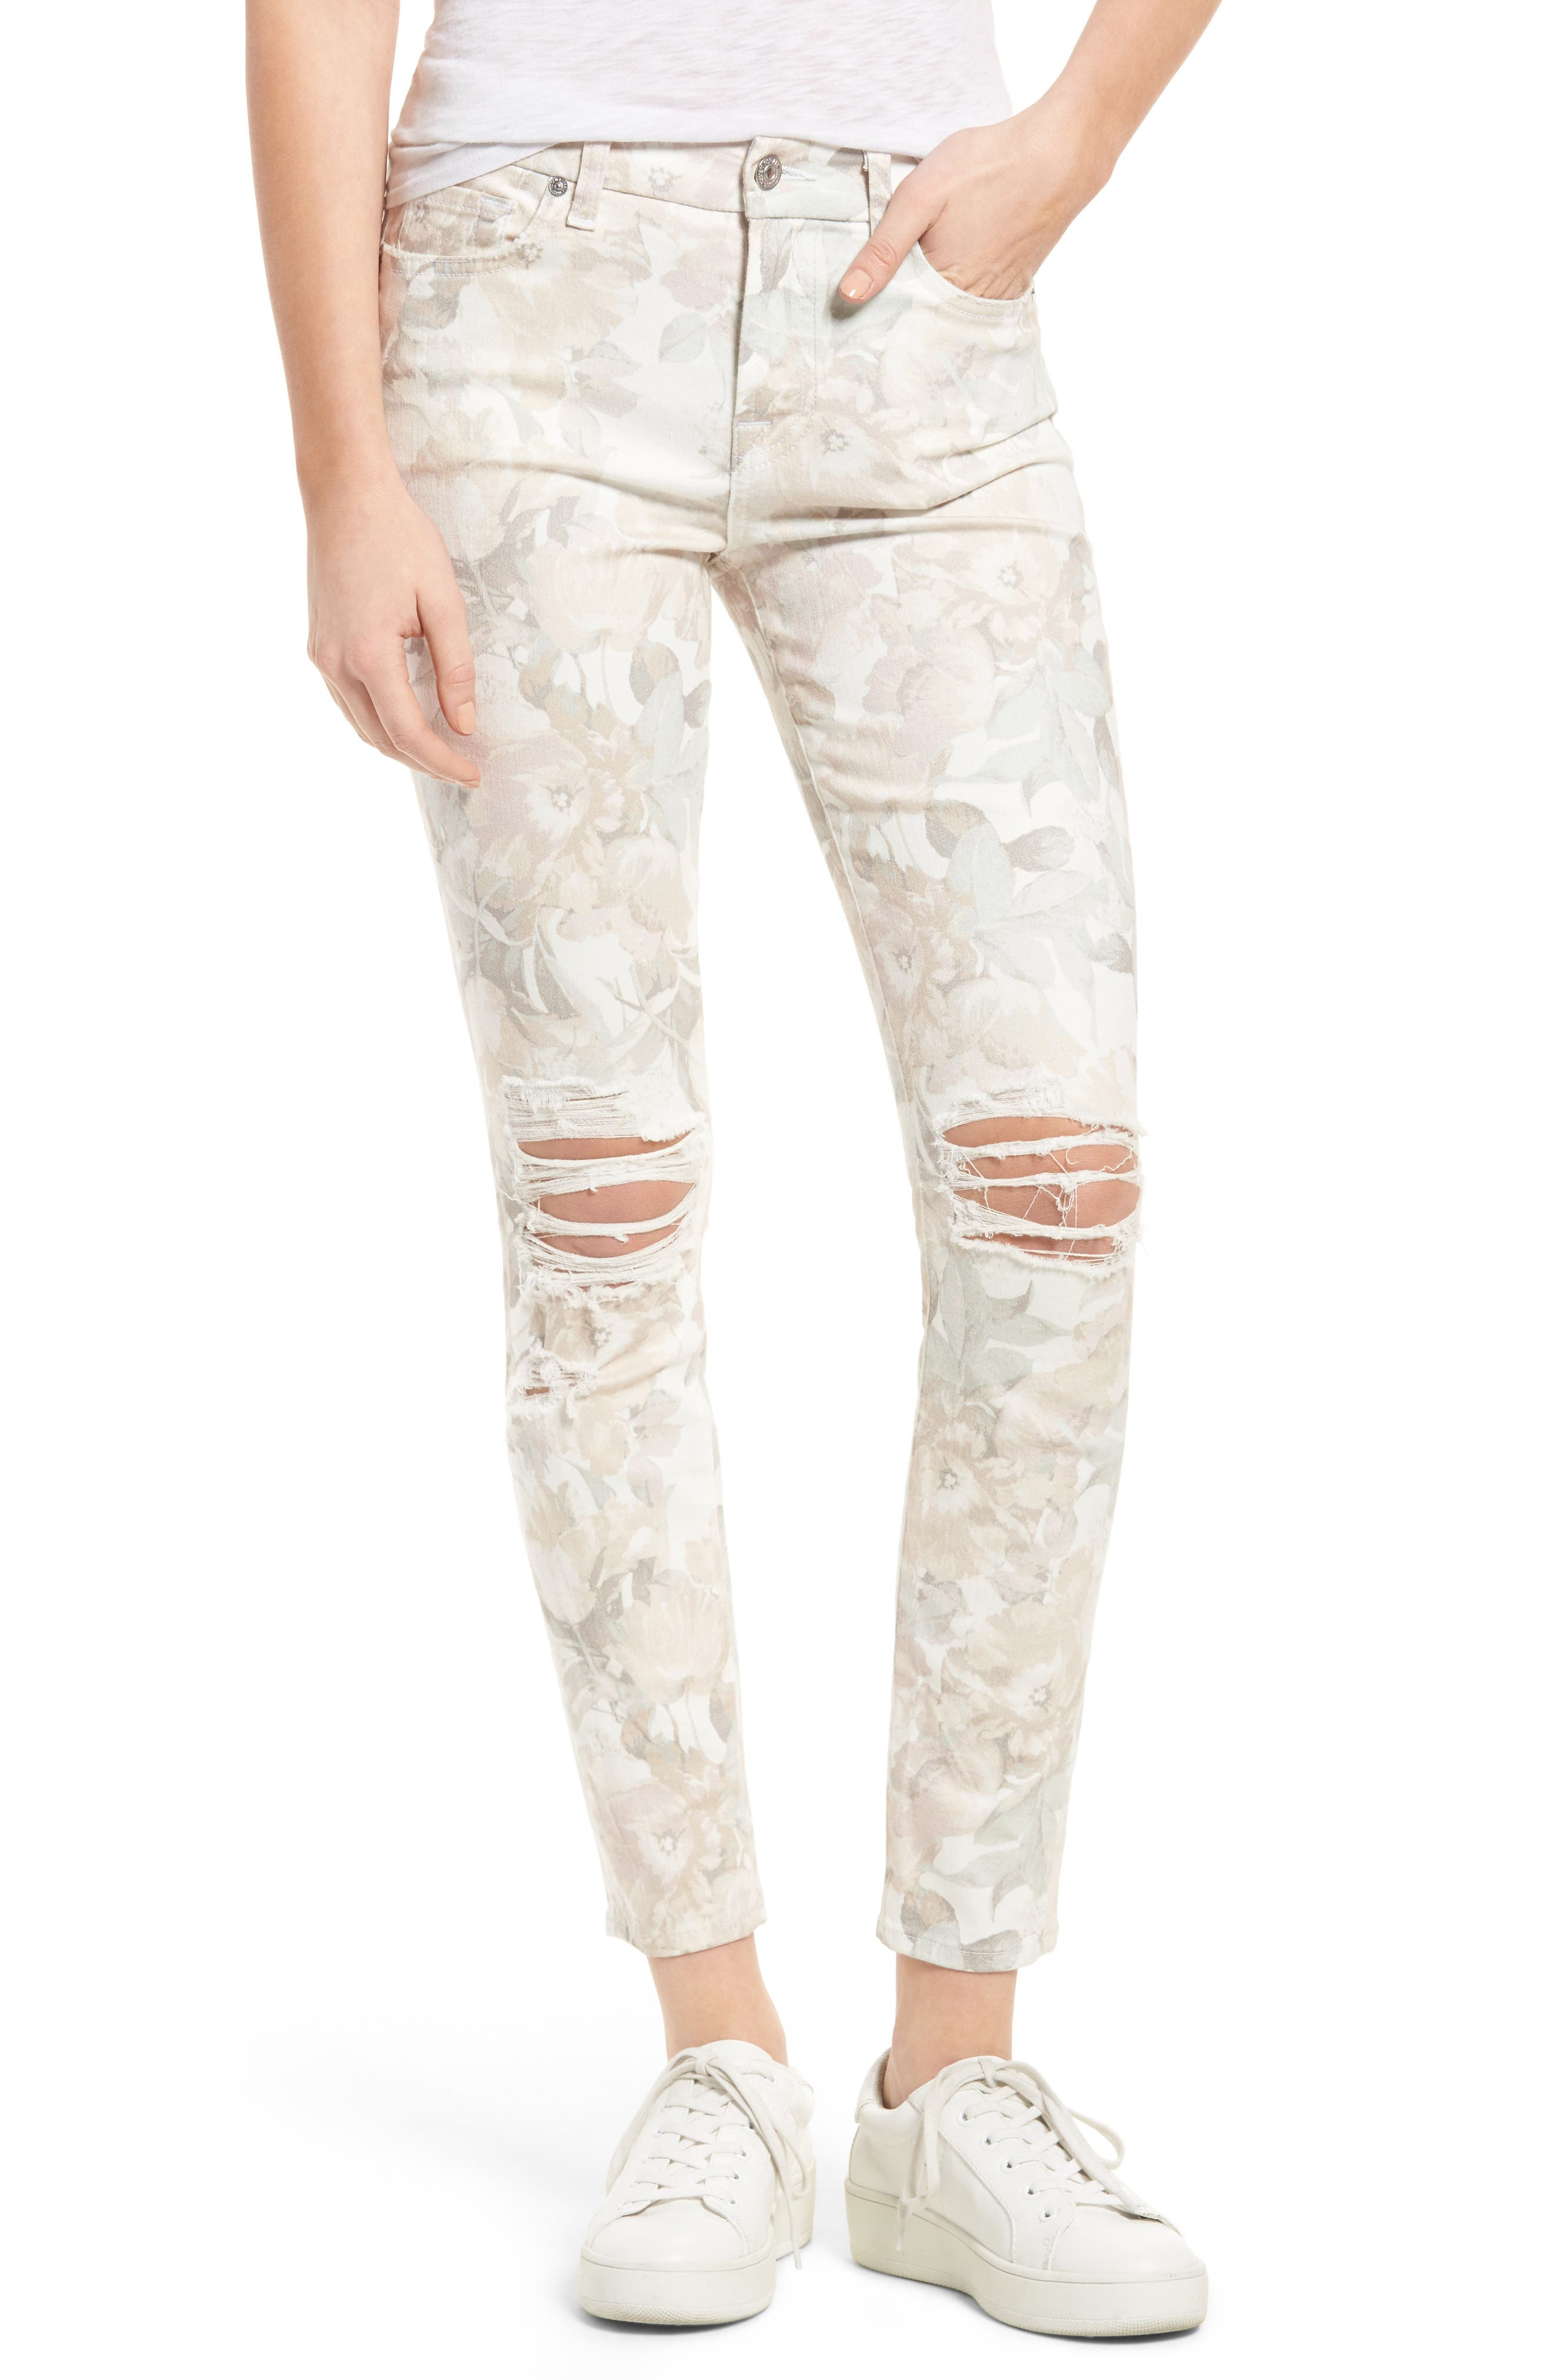 Alternate Image 1 Selected - 7 For All Mankind® Ankle Skinny Jeans (Sydney Garden)